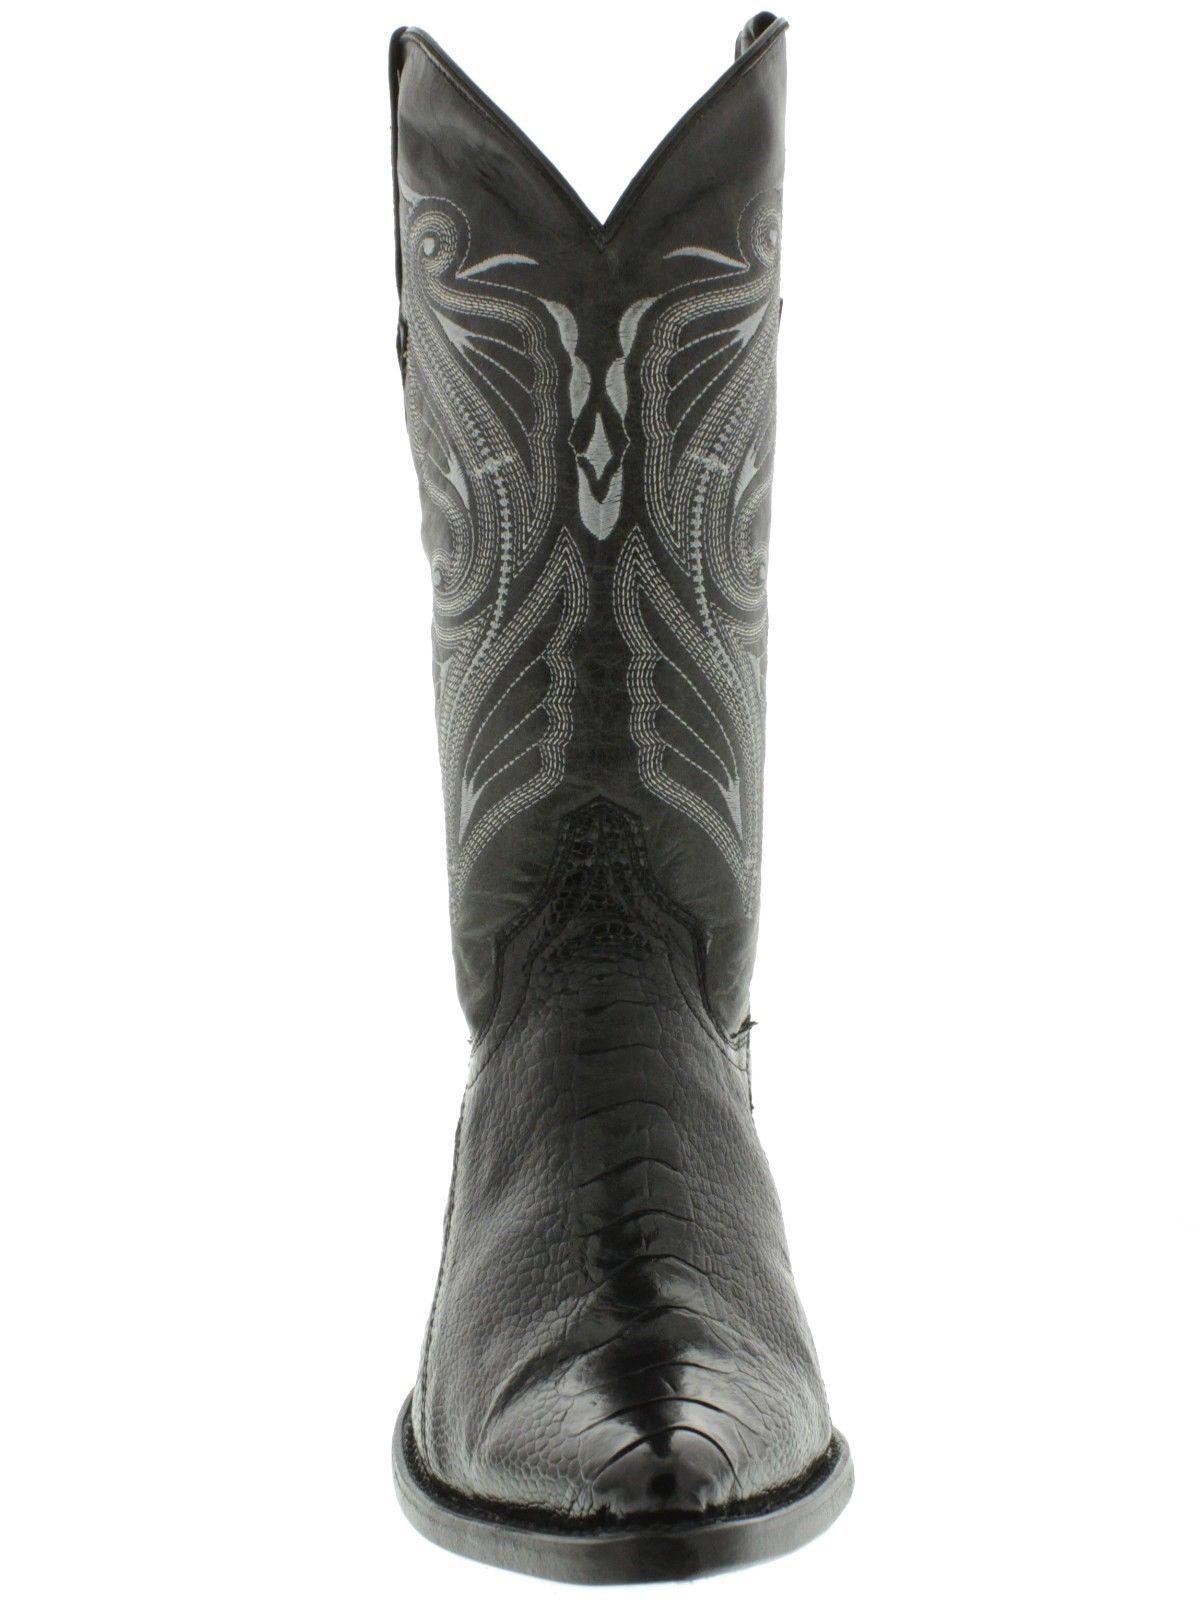 Mens Black Stingray Pattern Leather Western Cowboy Boots Row Stone Round Toe